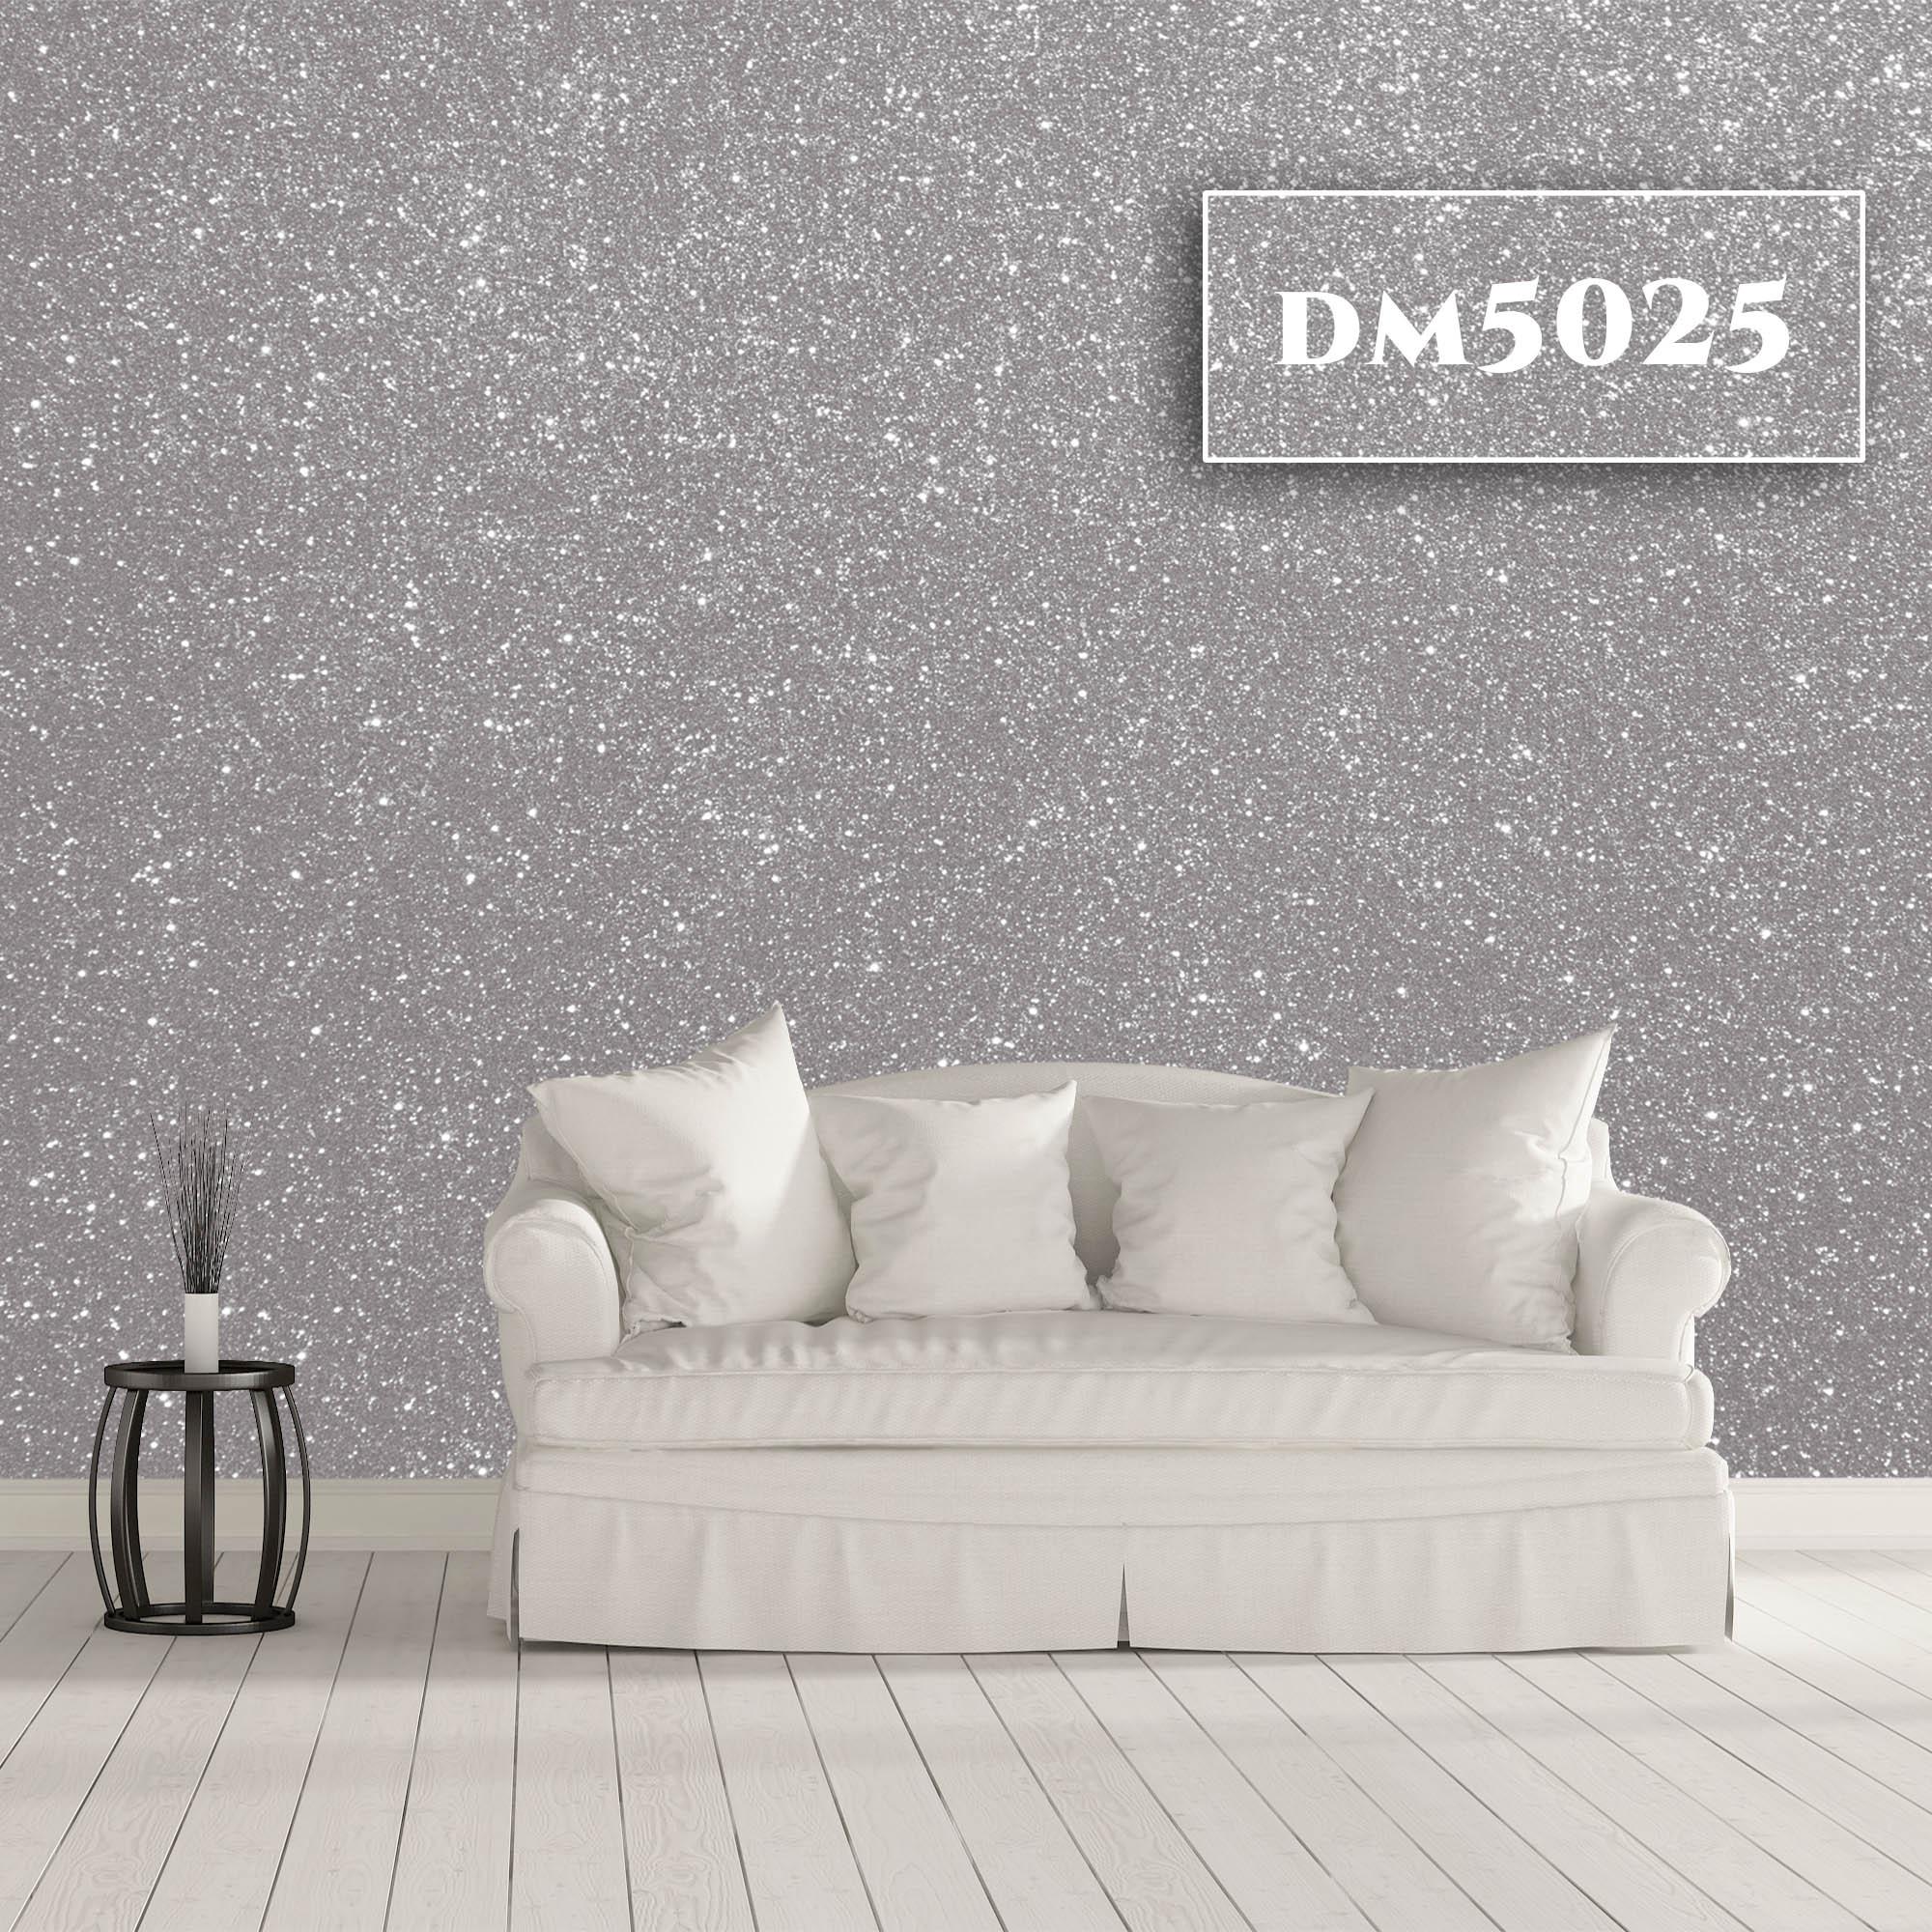 DM5025